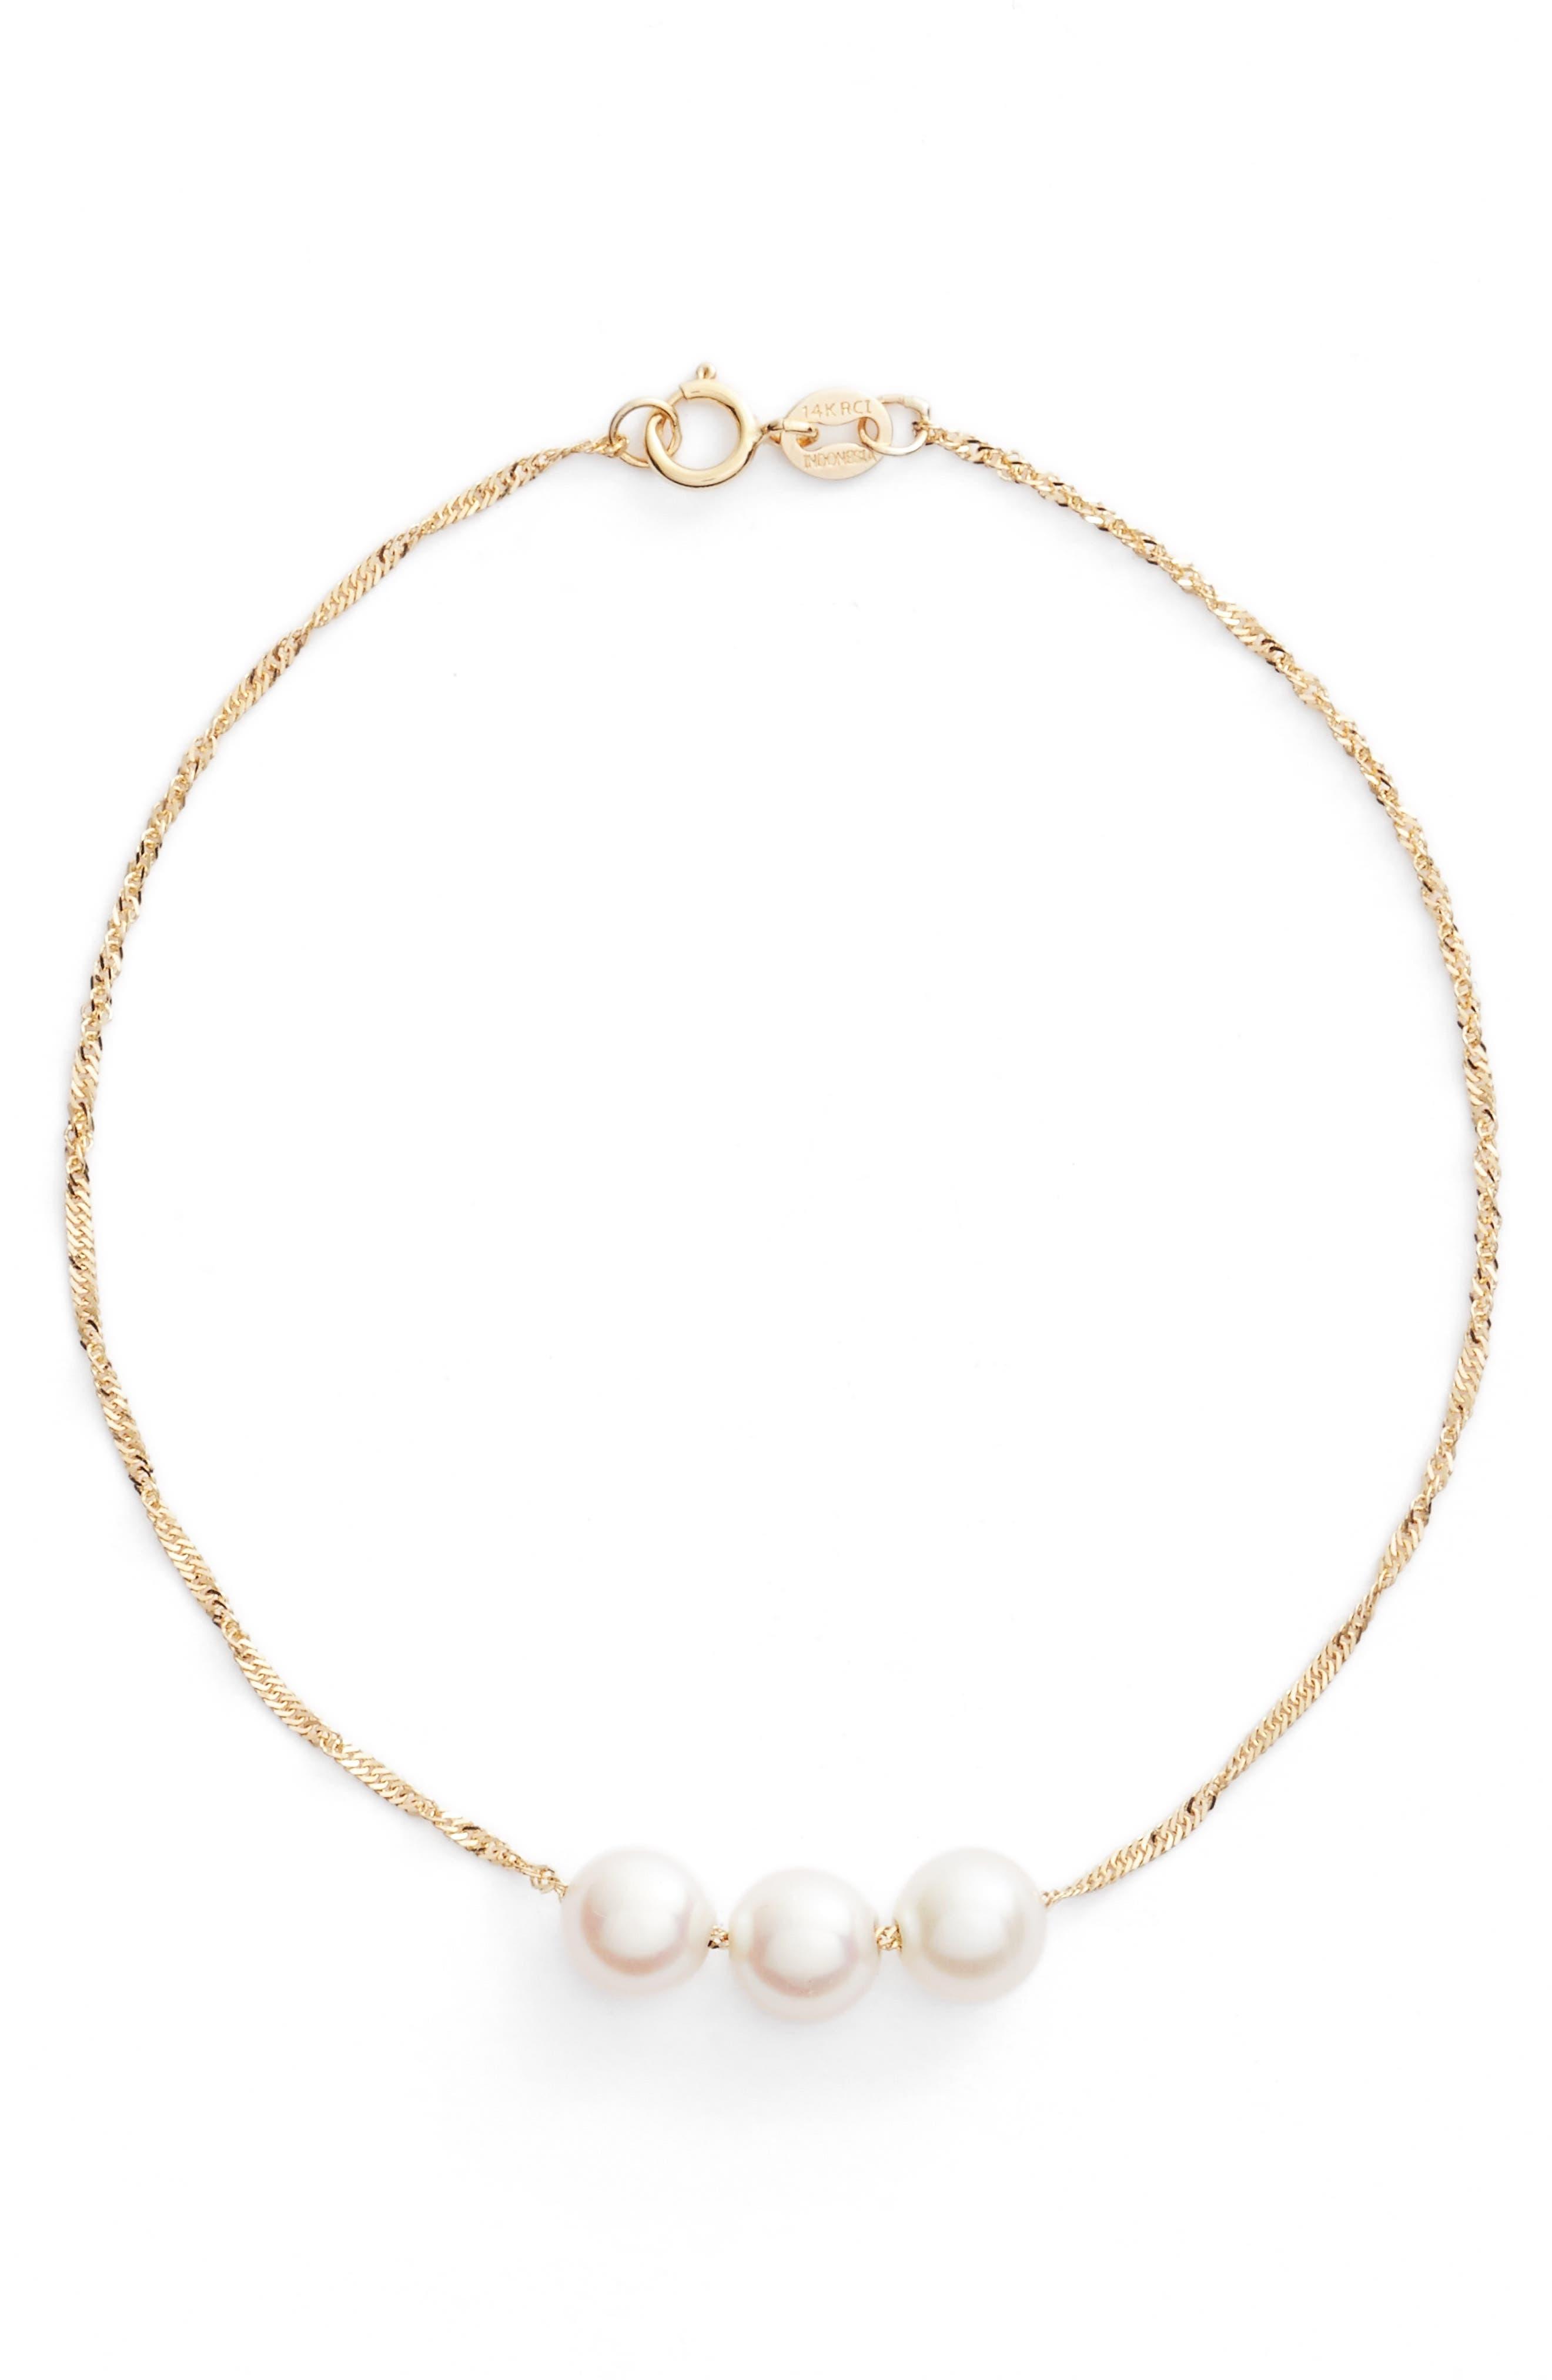 Triple Pearl Line Bracelet,                             Main thumbnail 1, color,                             710